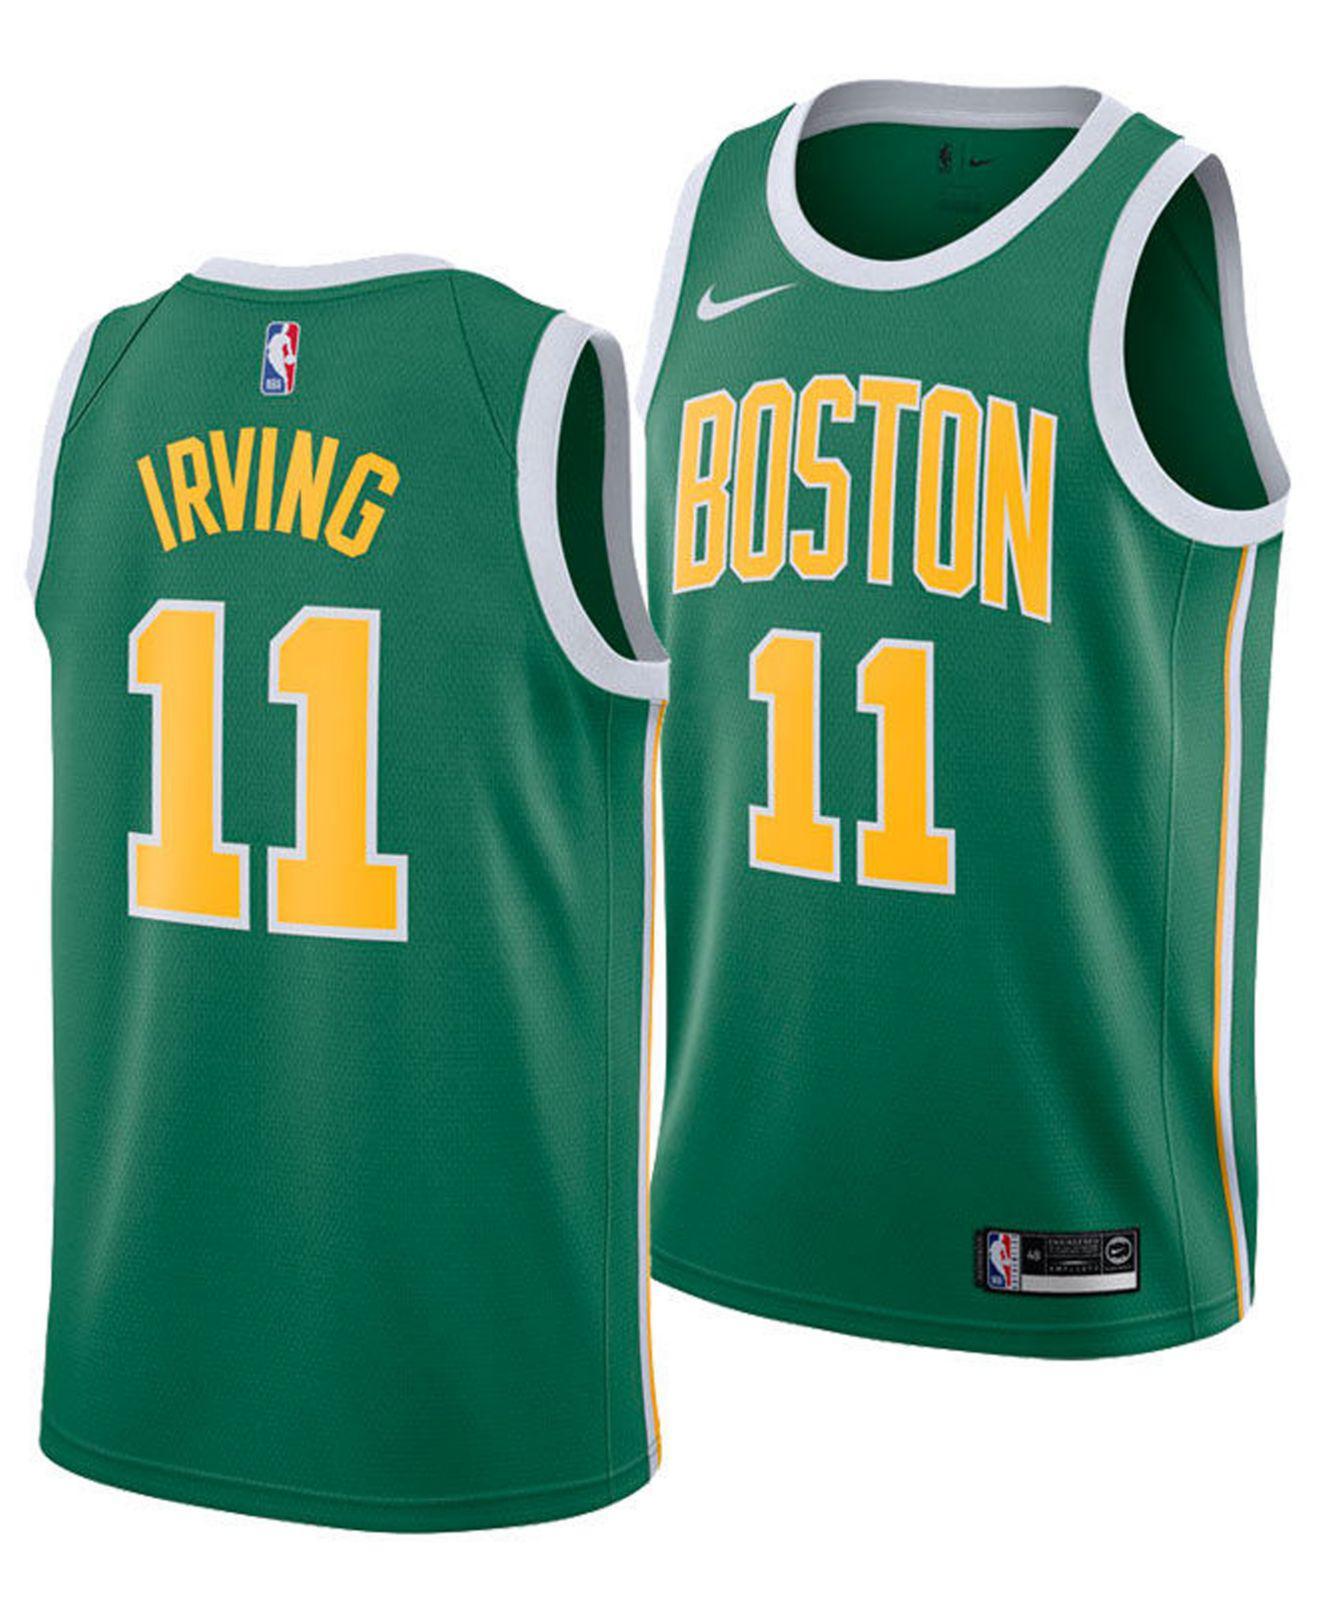 separation shoes 5a397 21b0d Men's Green Kyrie Irving Boston Celtics Earned Edition Swingman Jersey